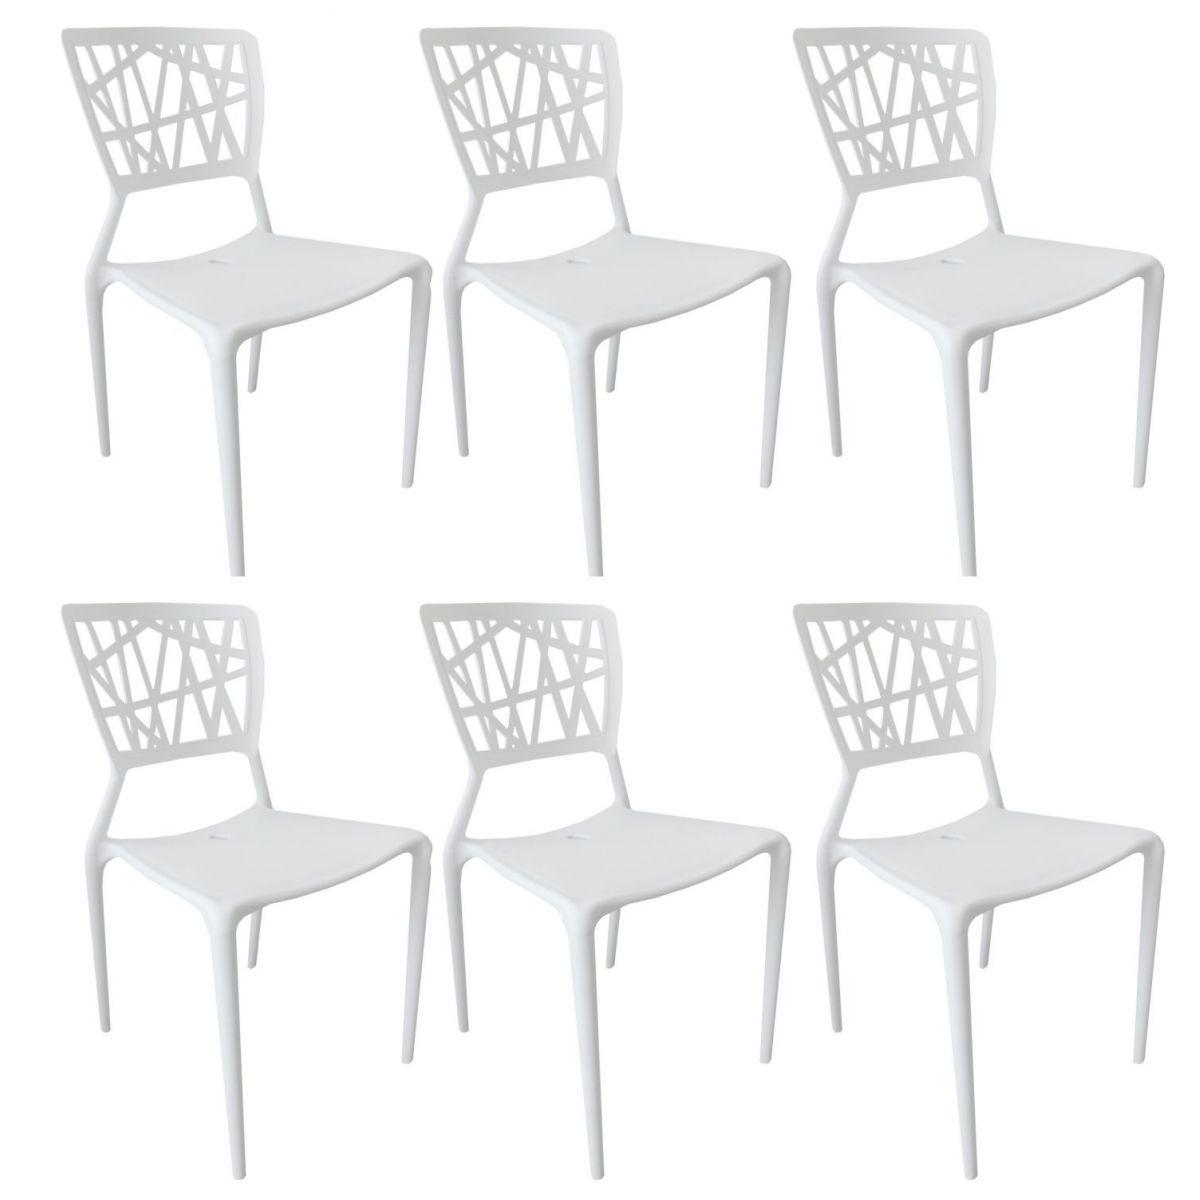 Kit 6 Cadeiras Design Melissa Pelegrin PEL 1193 Cor Branca